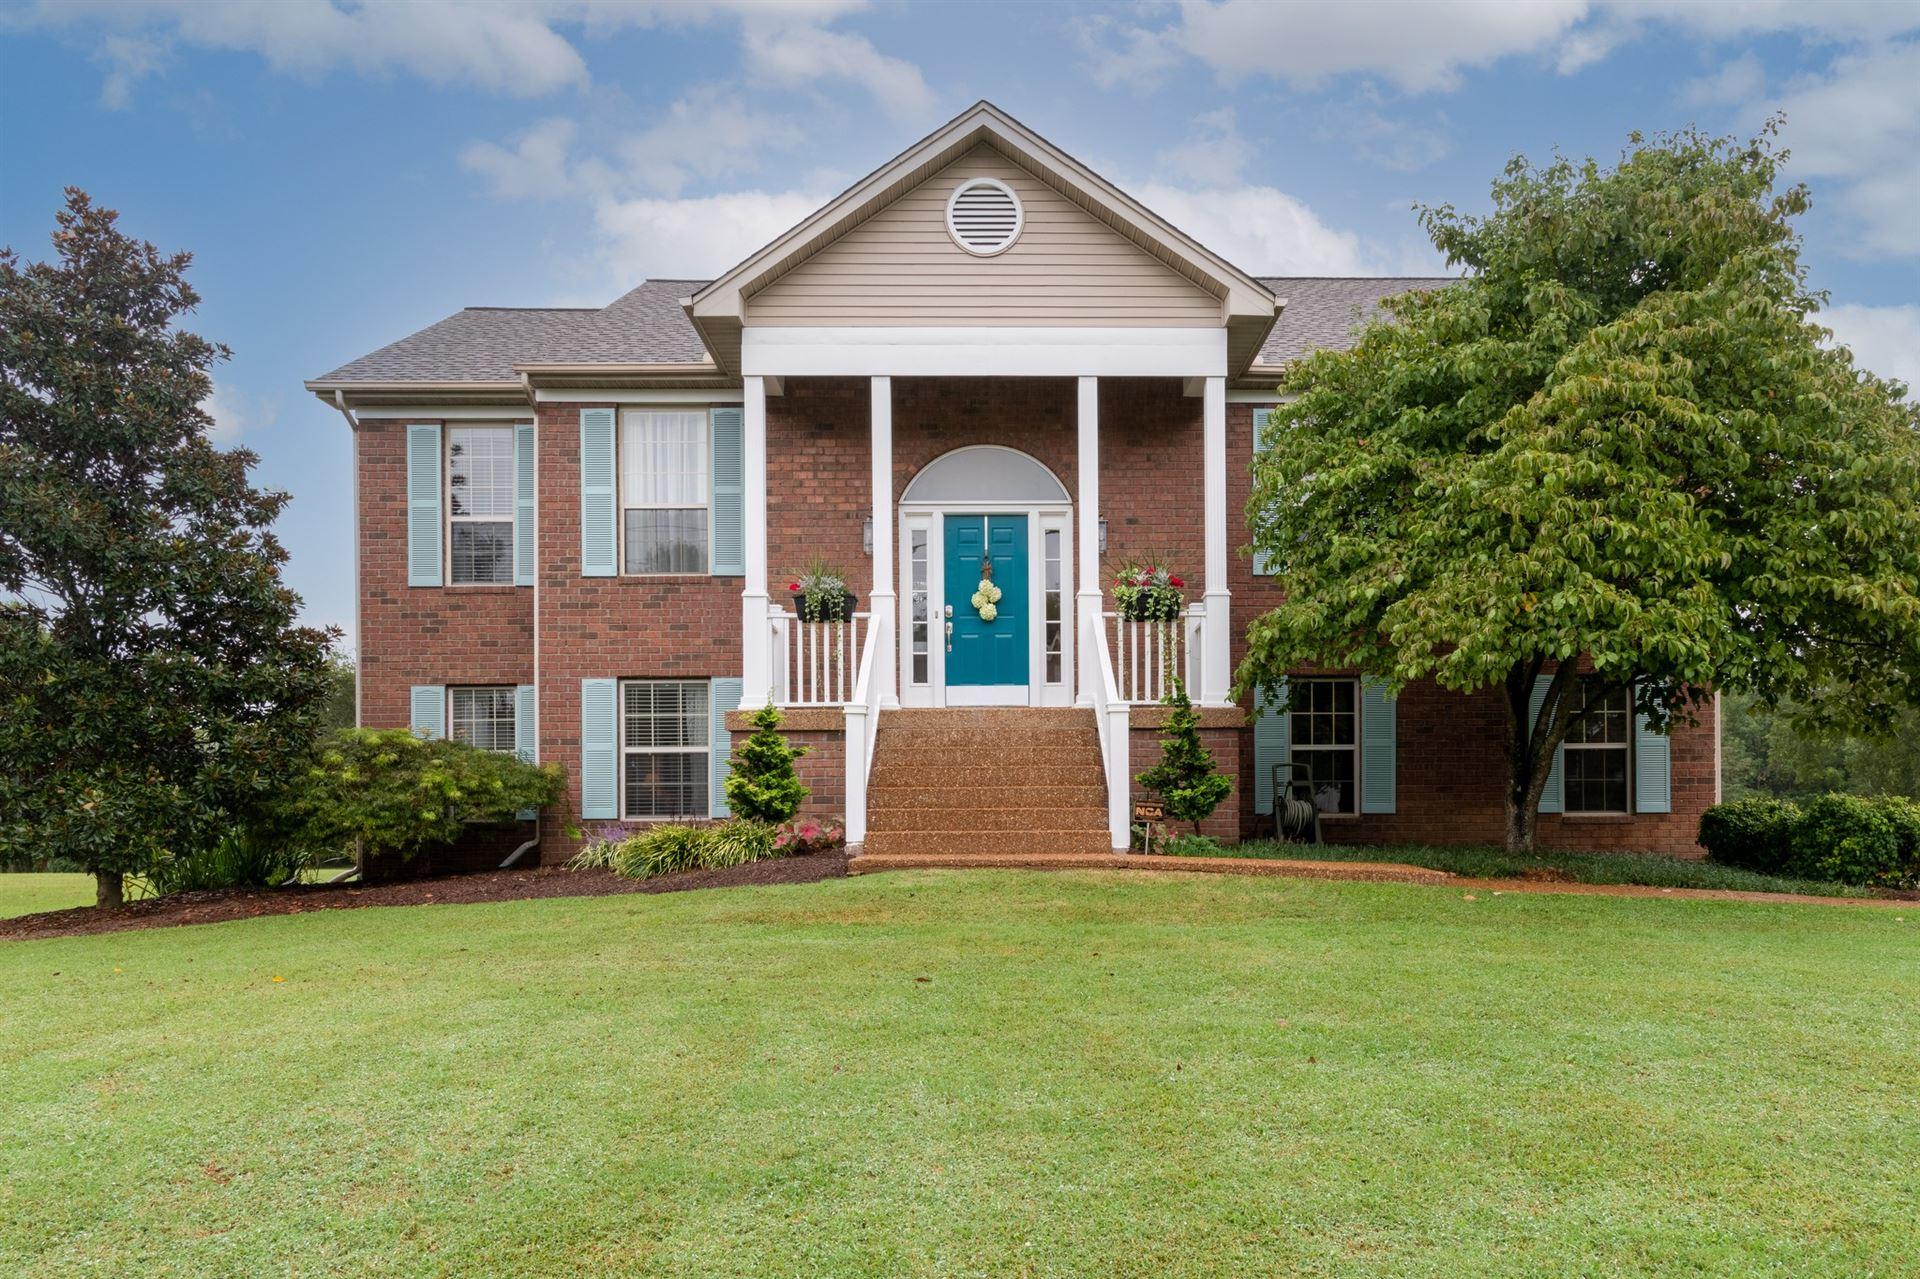 392 Clarkston Dr, Smyrna, TN 37167 - MLS#: 2292189